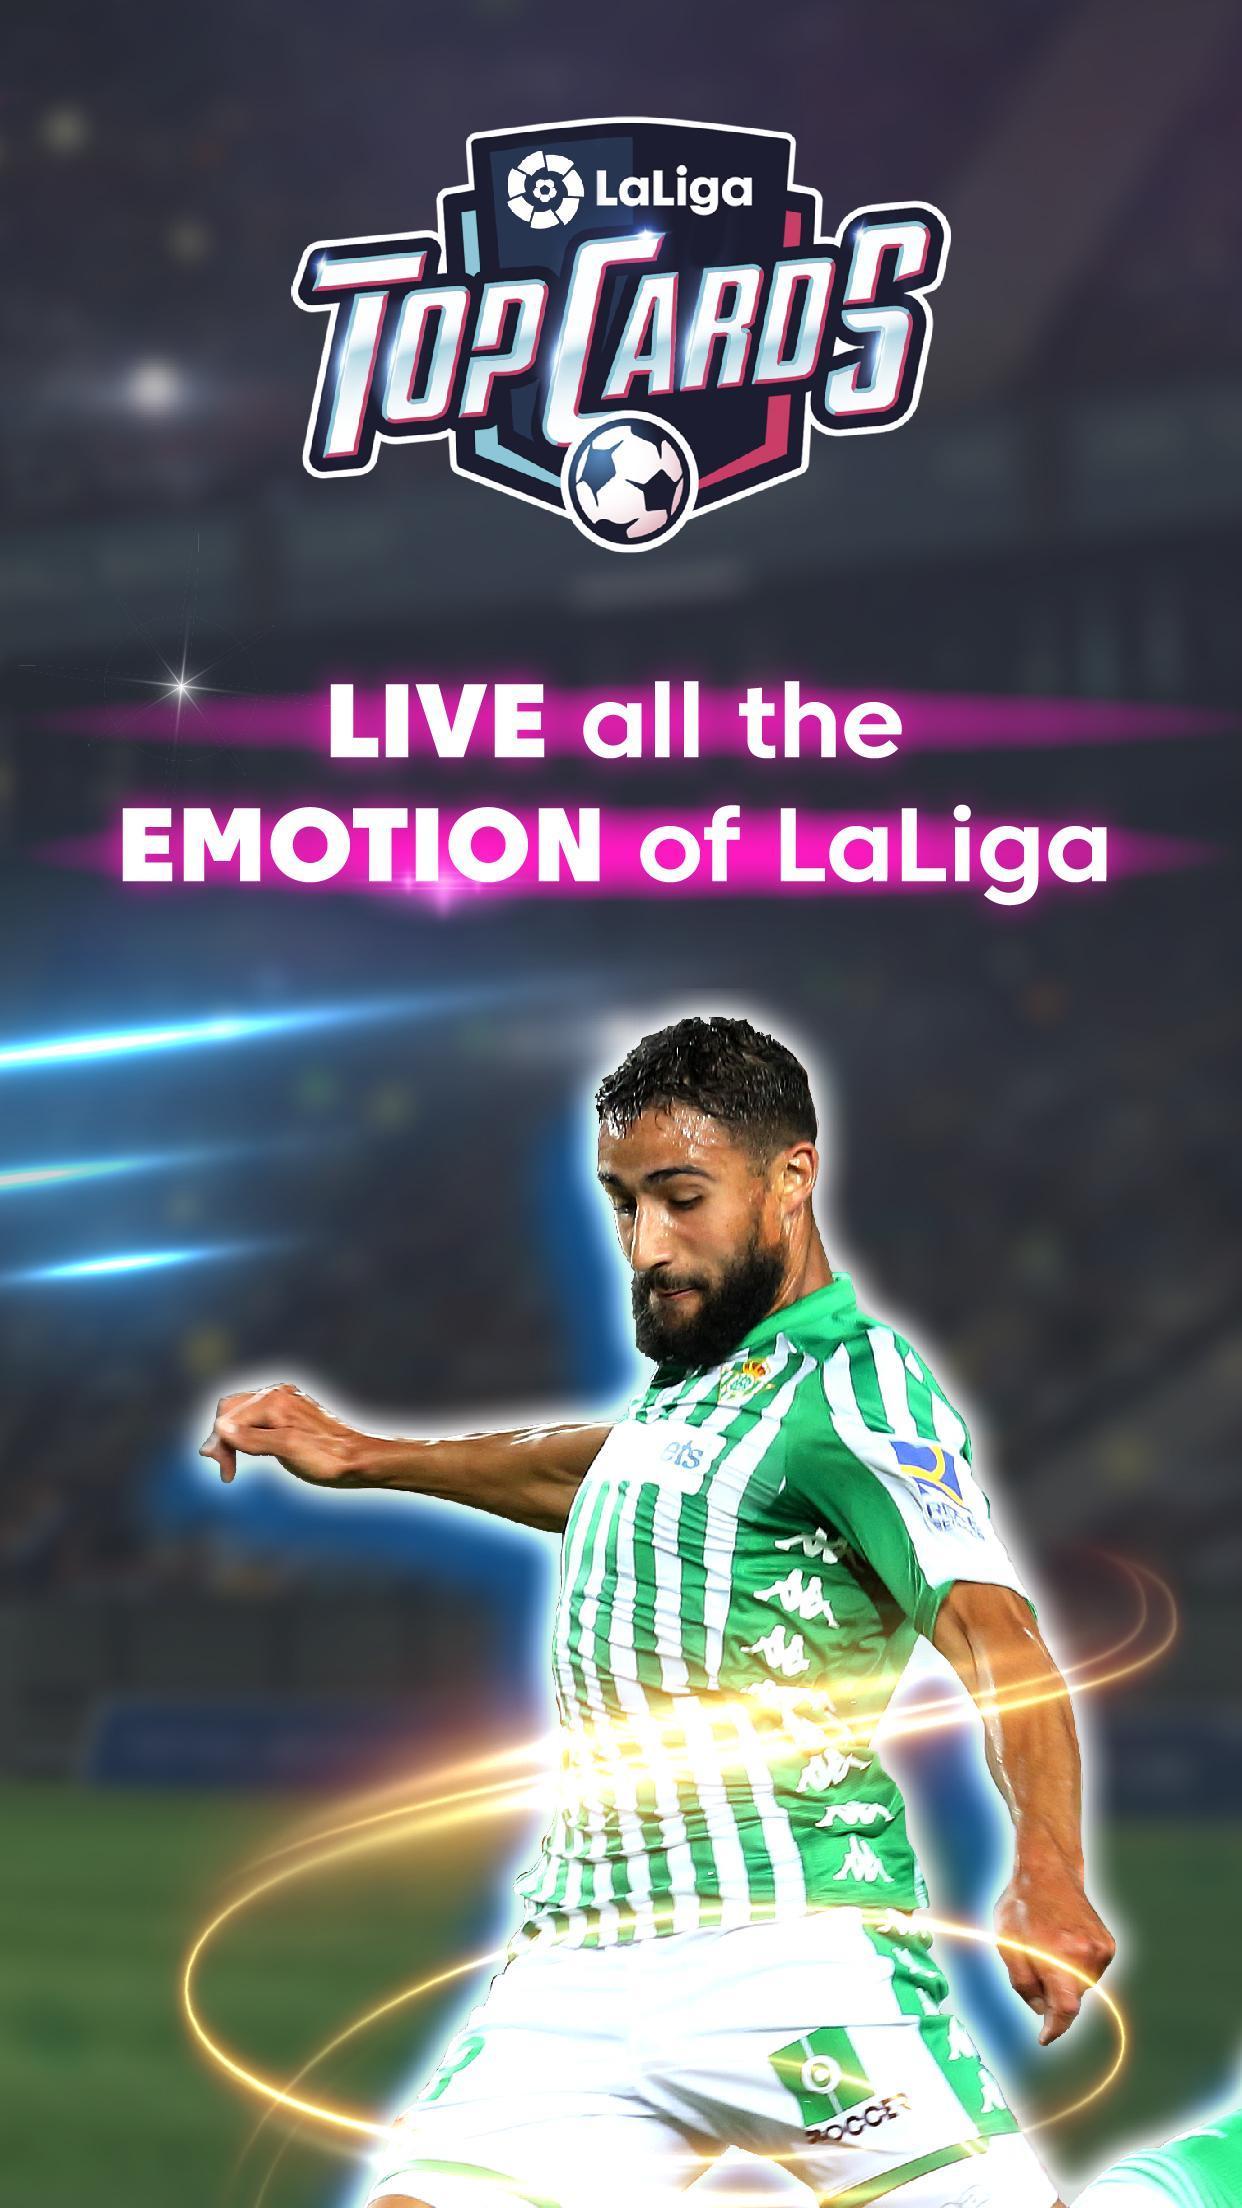 LaLiga Top Cards 2020 - Soccer Card Battle Game 4.1.4 Screenshot 8